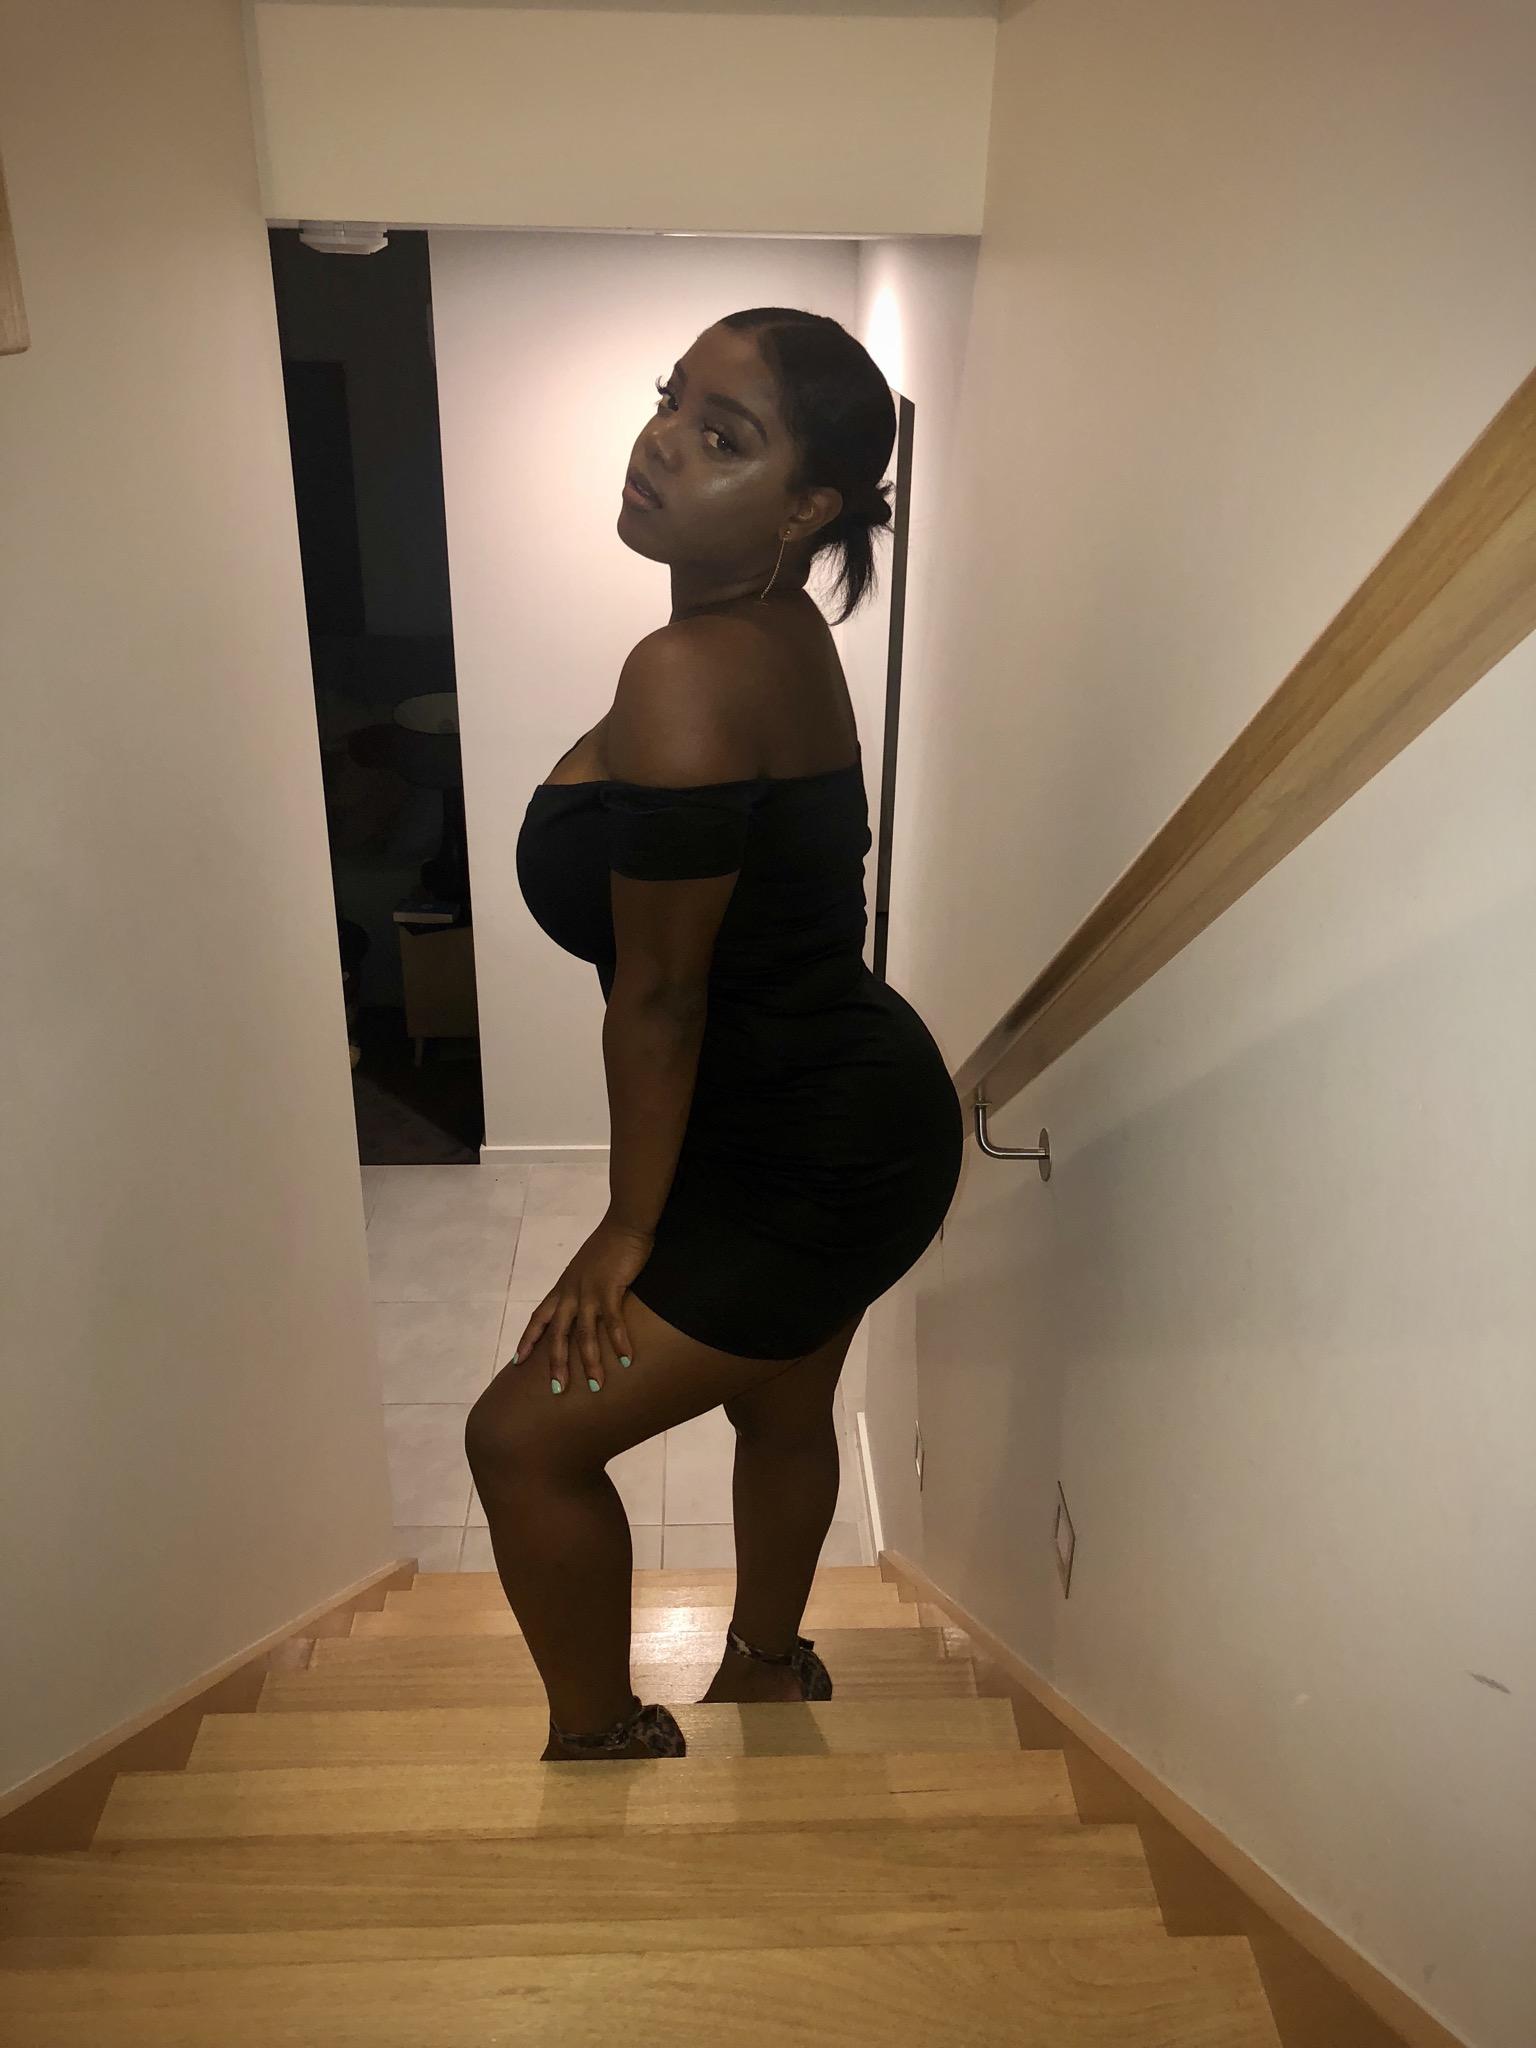 Female Stripper - Chicago